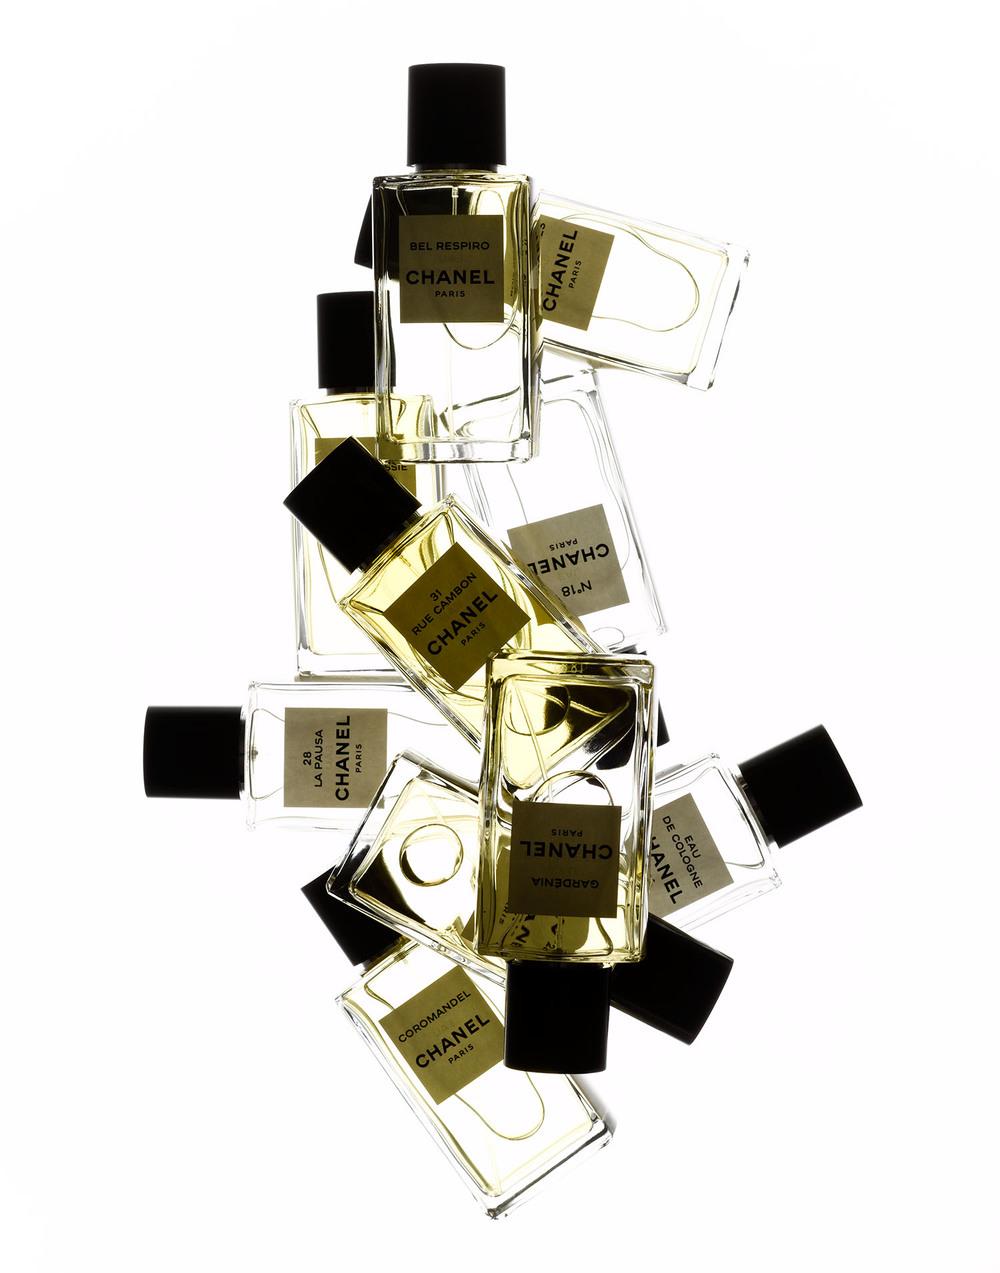 47 chanel perfume v1.jpg